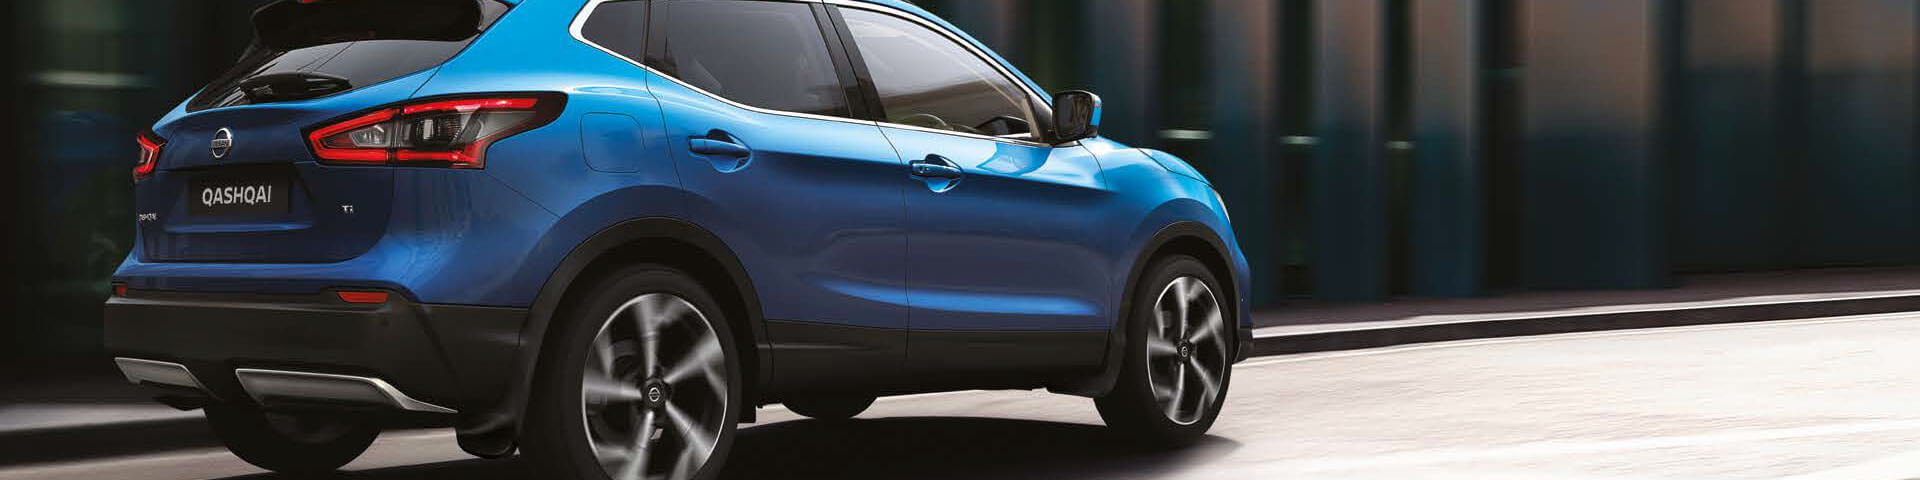 Nissan Genuine Parts Rockhampton Dc Motors Spescial Order By Request